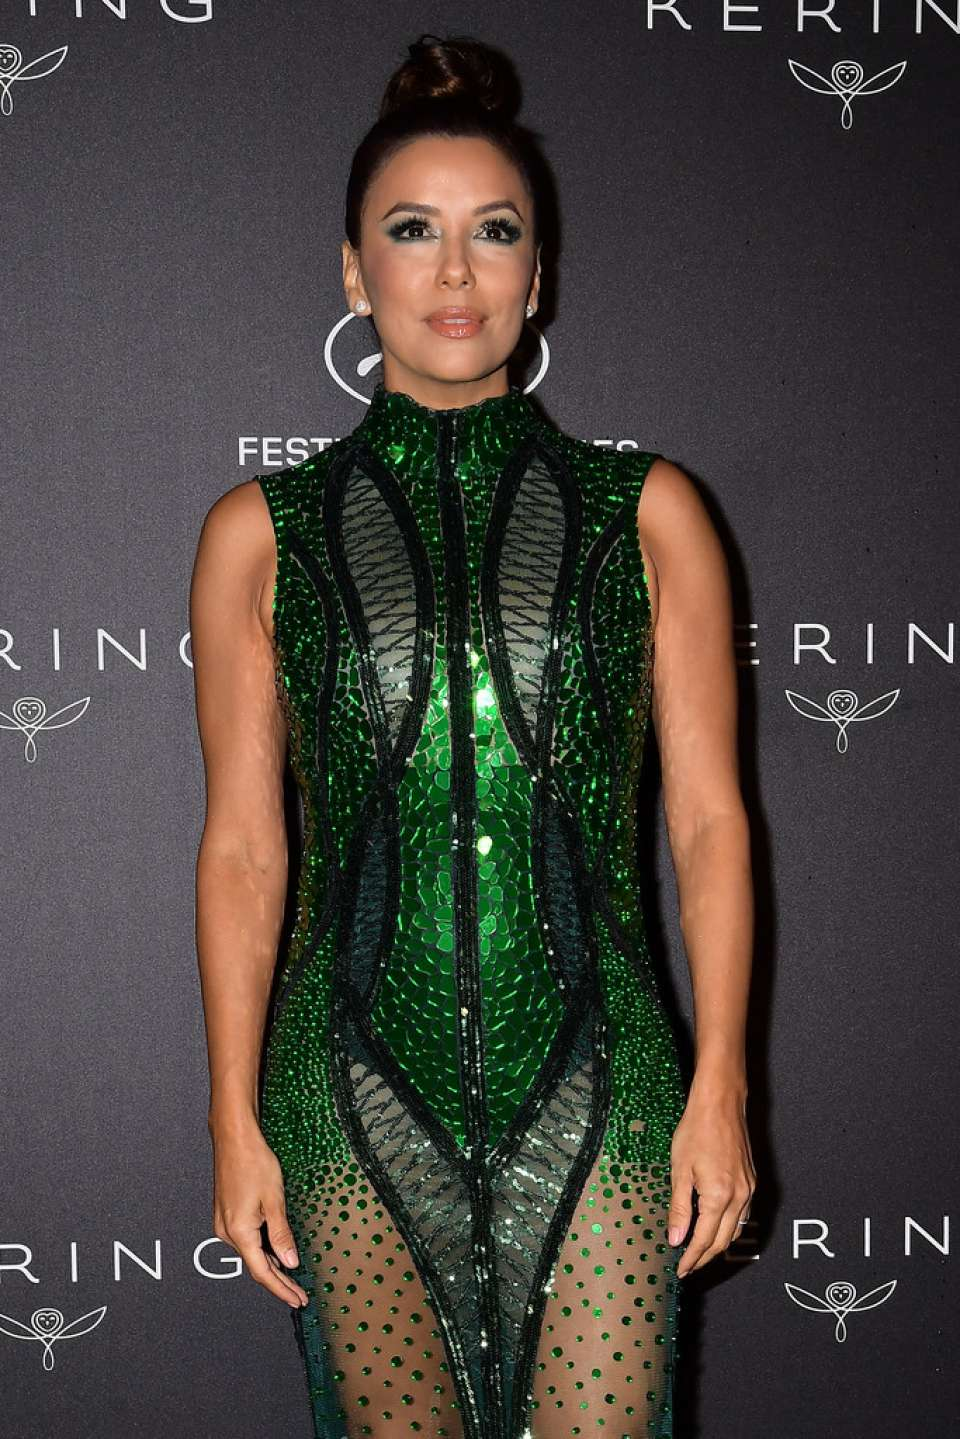 Eva Longoria - Kering Women in Motion Awards 2019 in Cannes